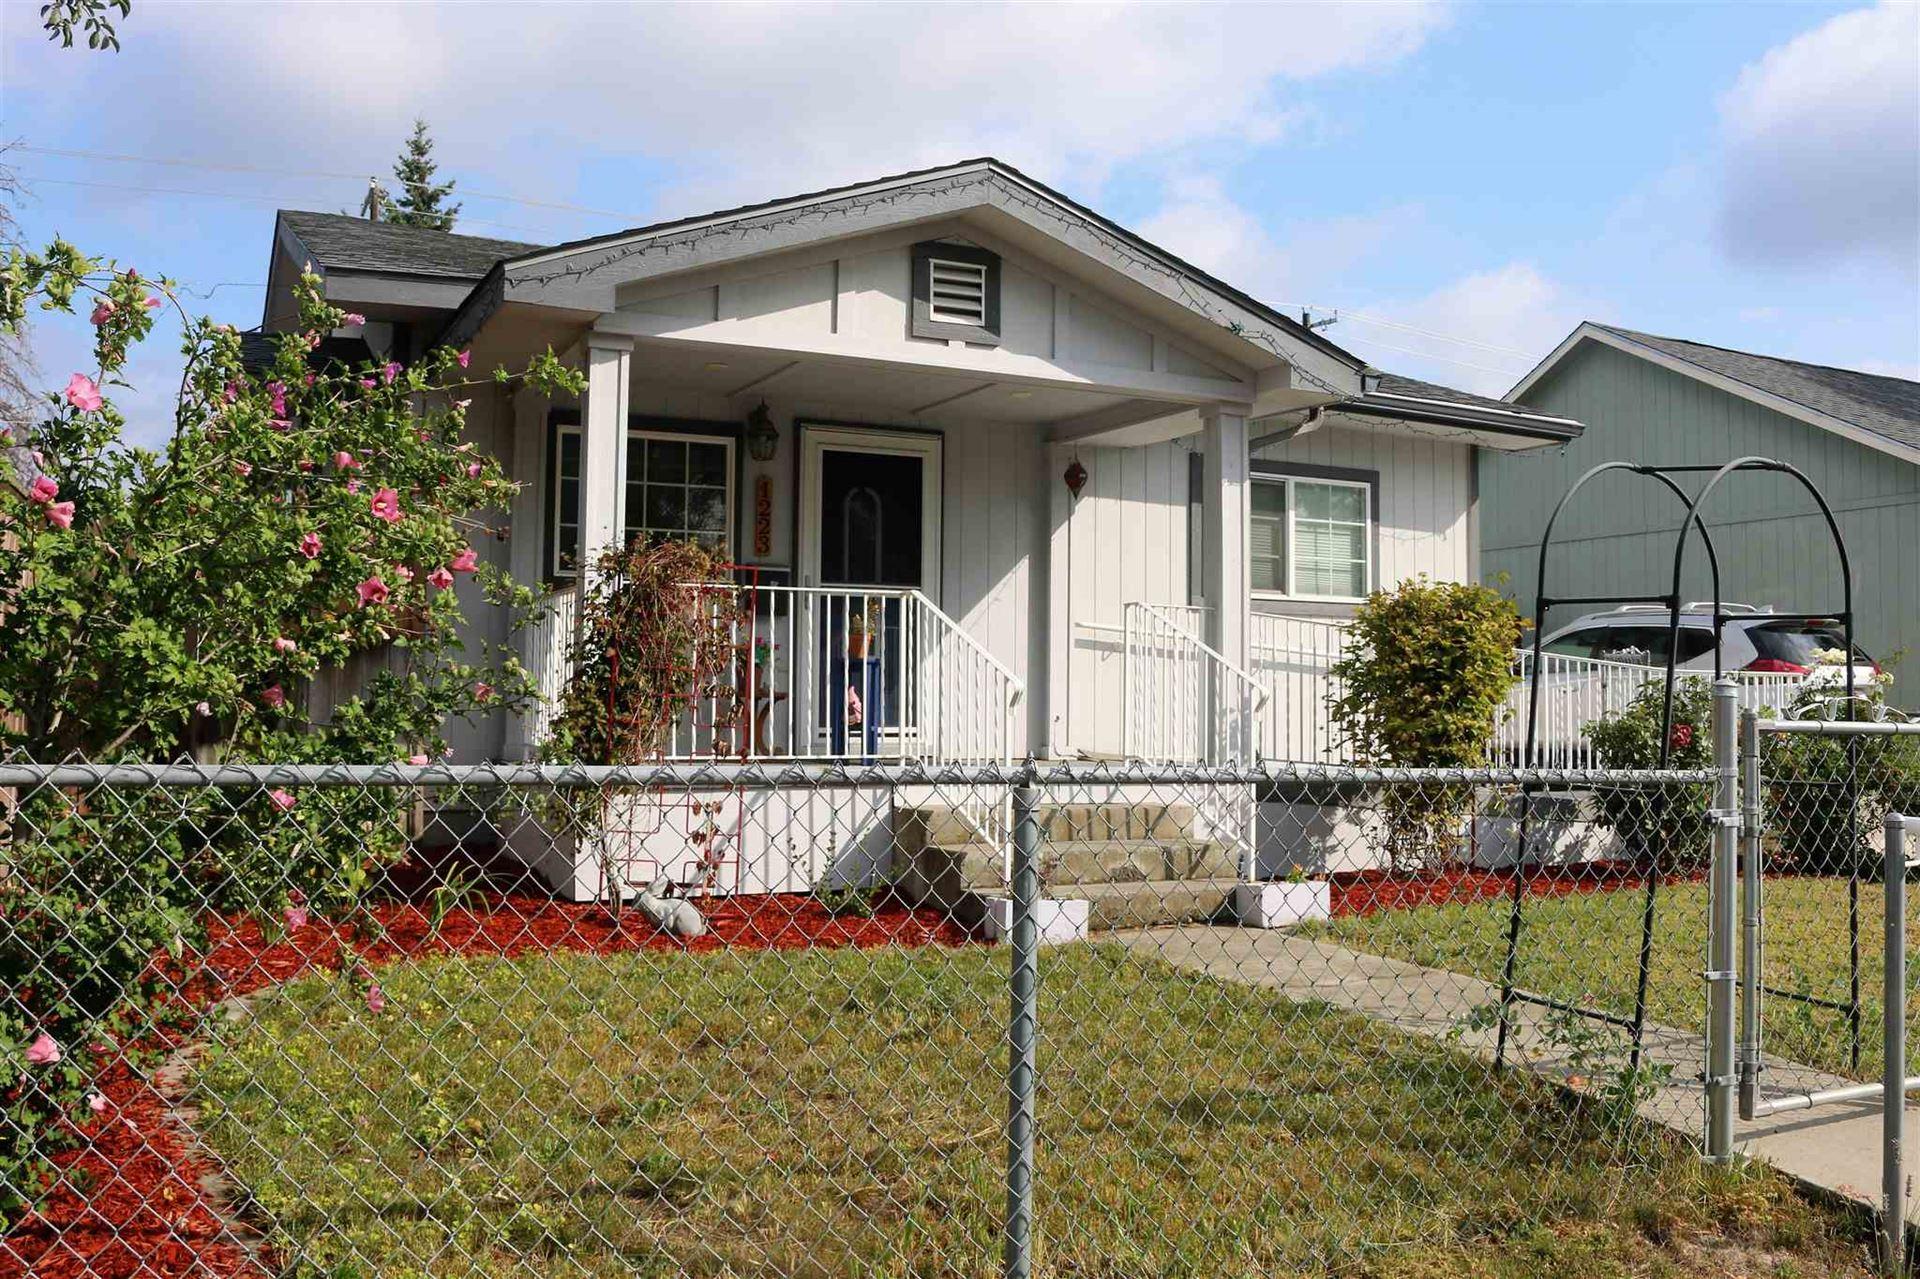 1223 E Rowan Ave, Spokane, WA 99207 - #: 202122244